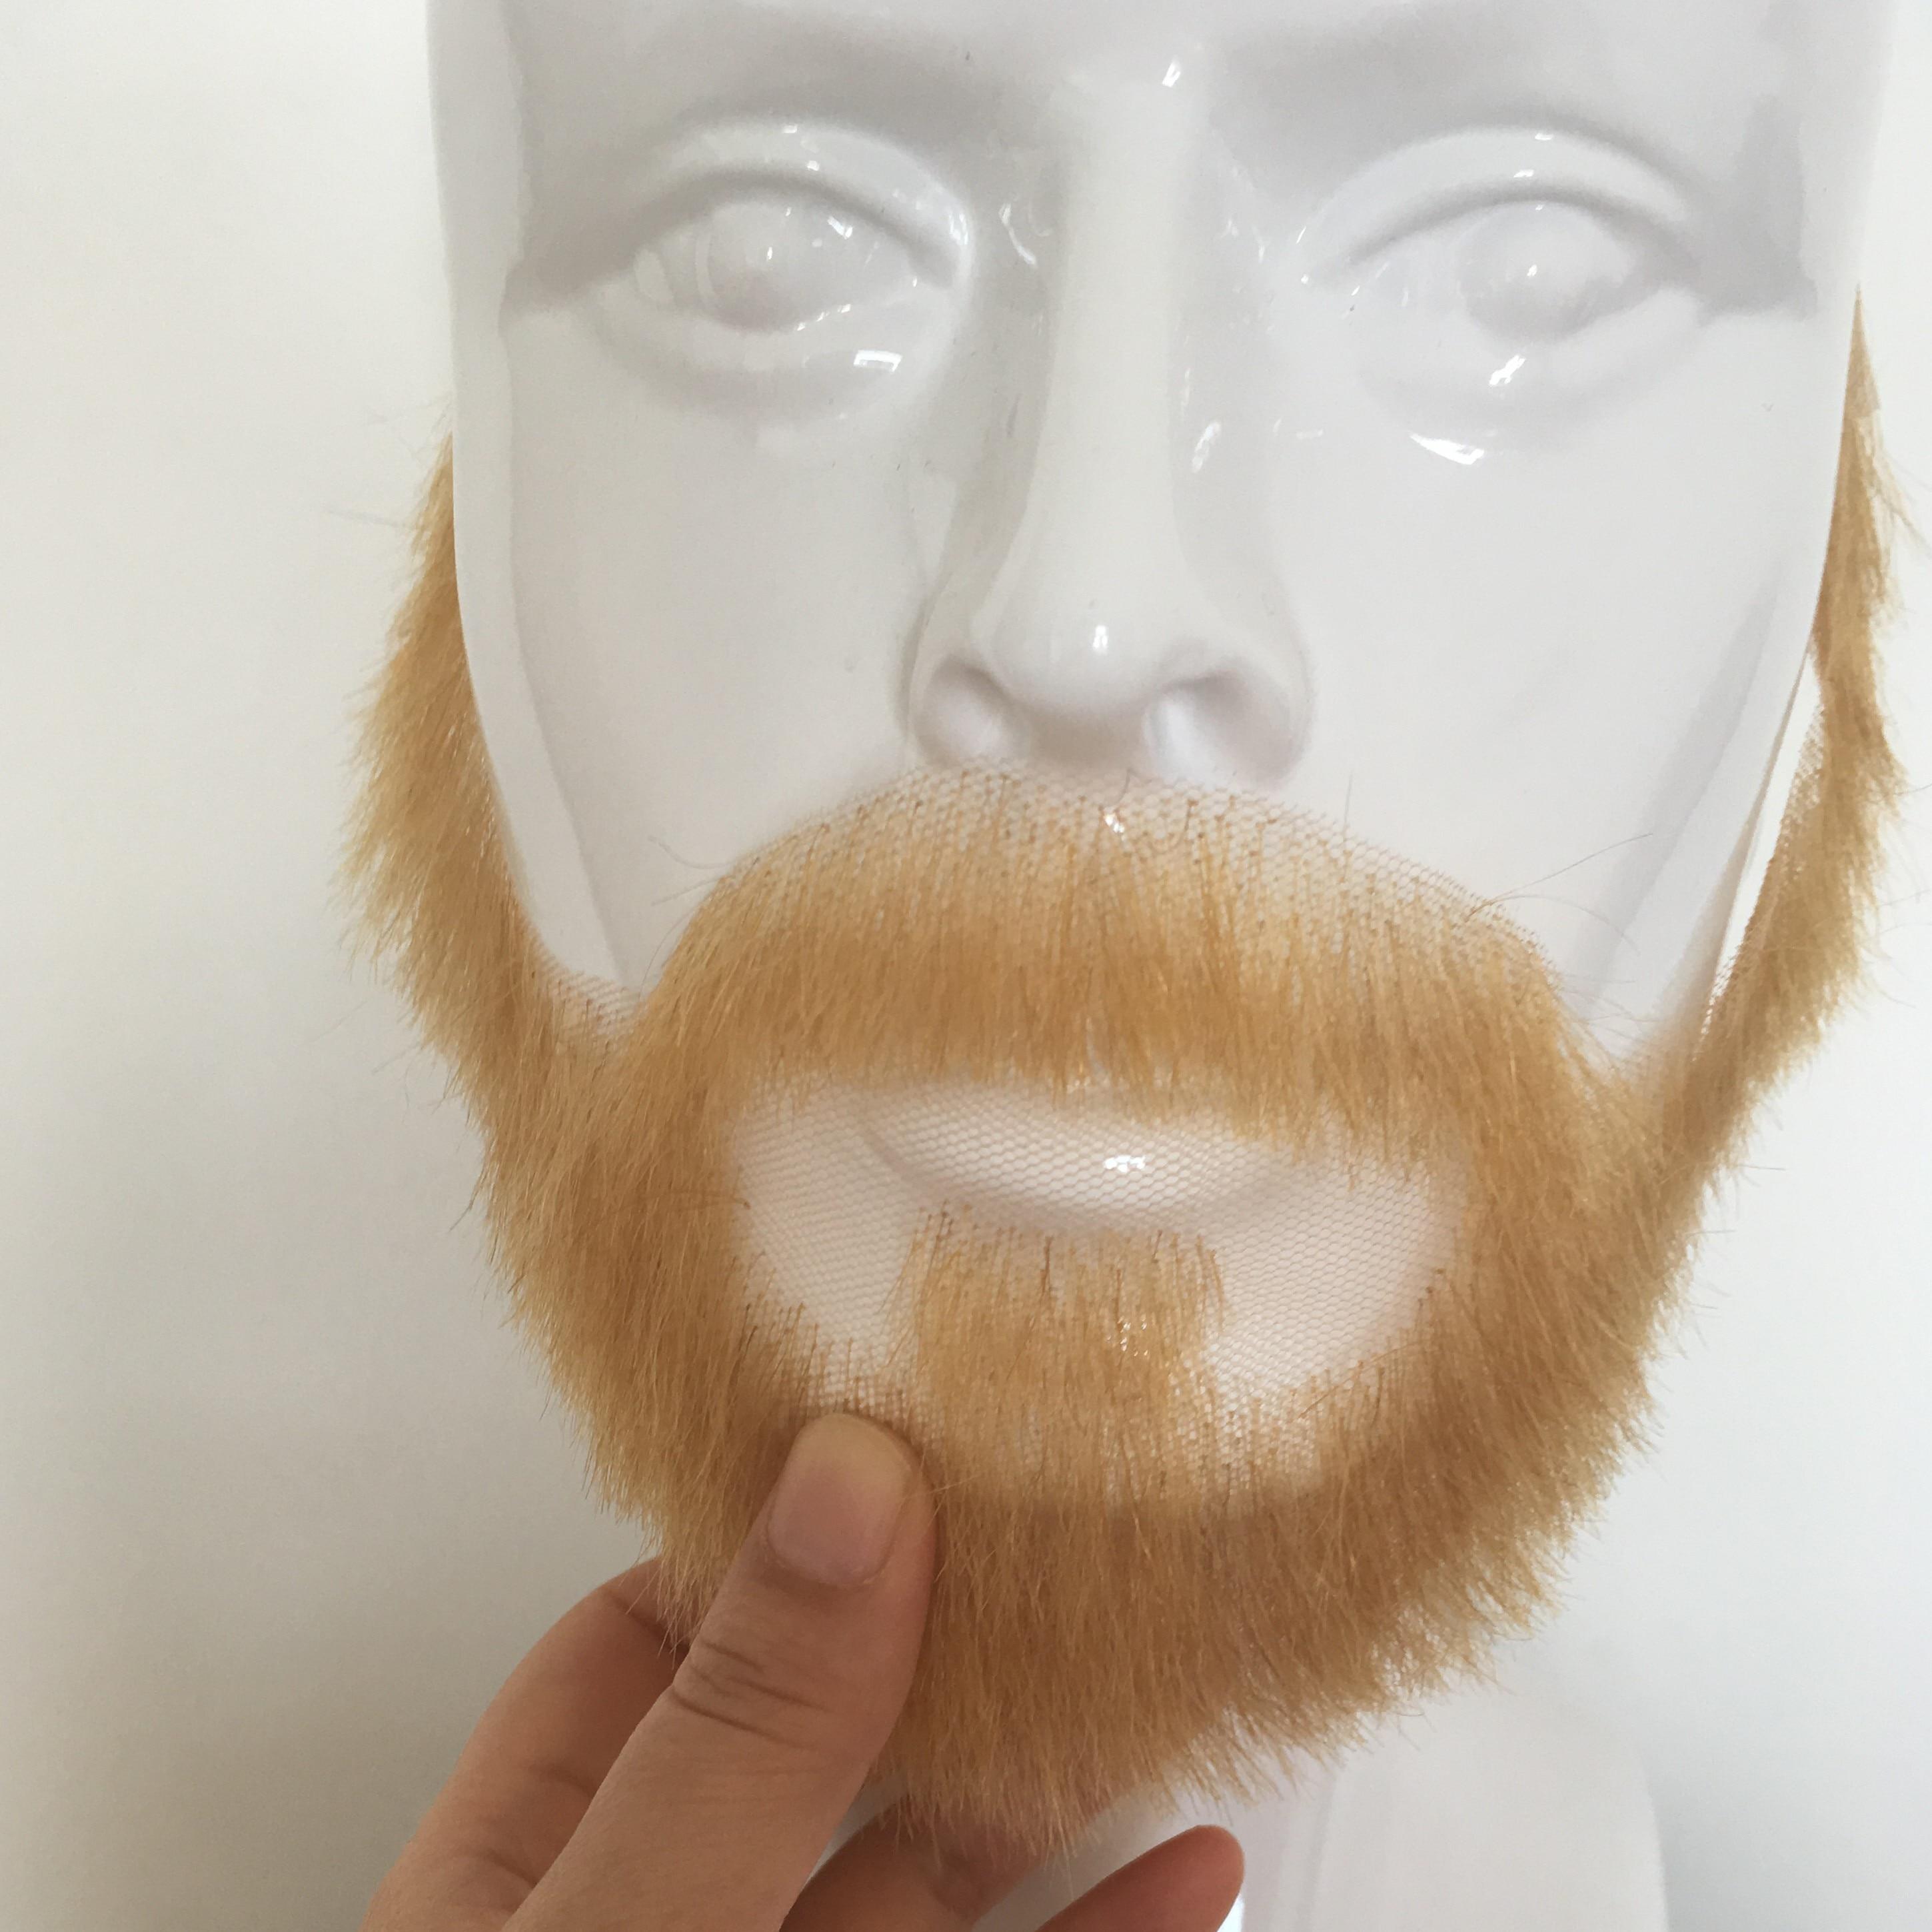 Black Fake Beard Mustache Eyebrows Self Adhesive Facial Hair set